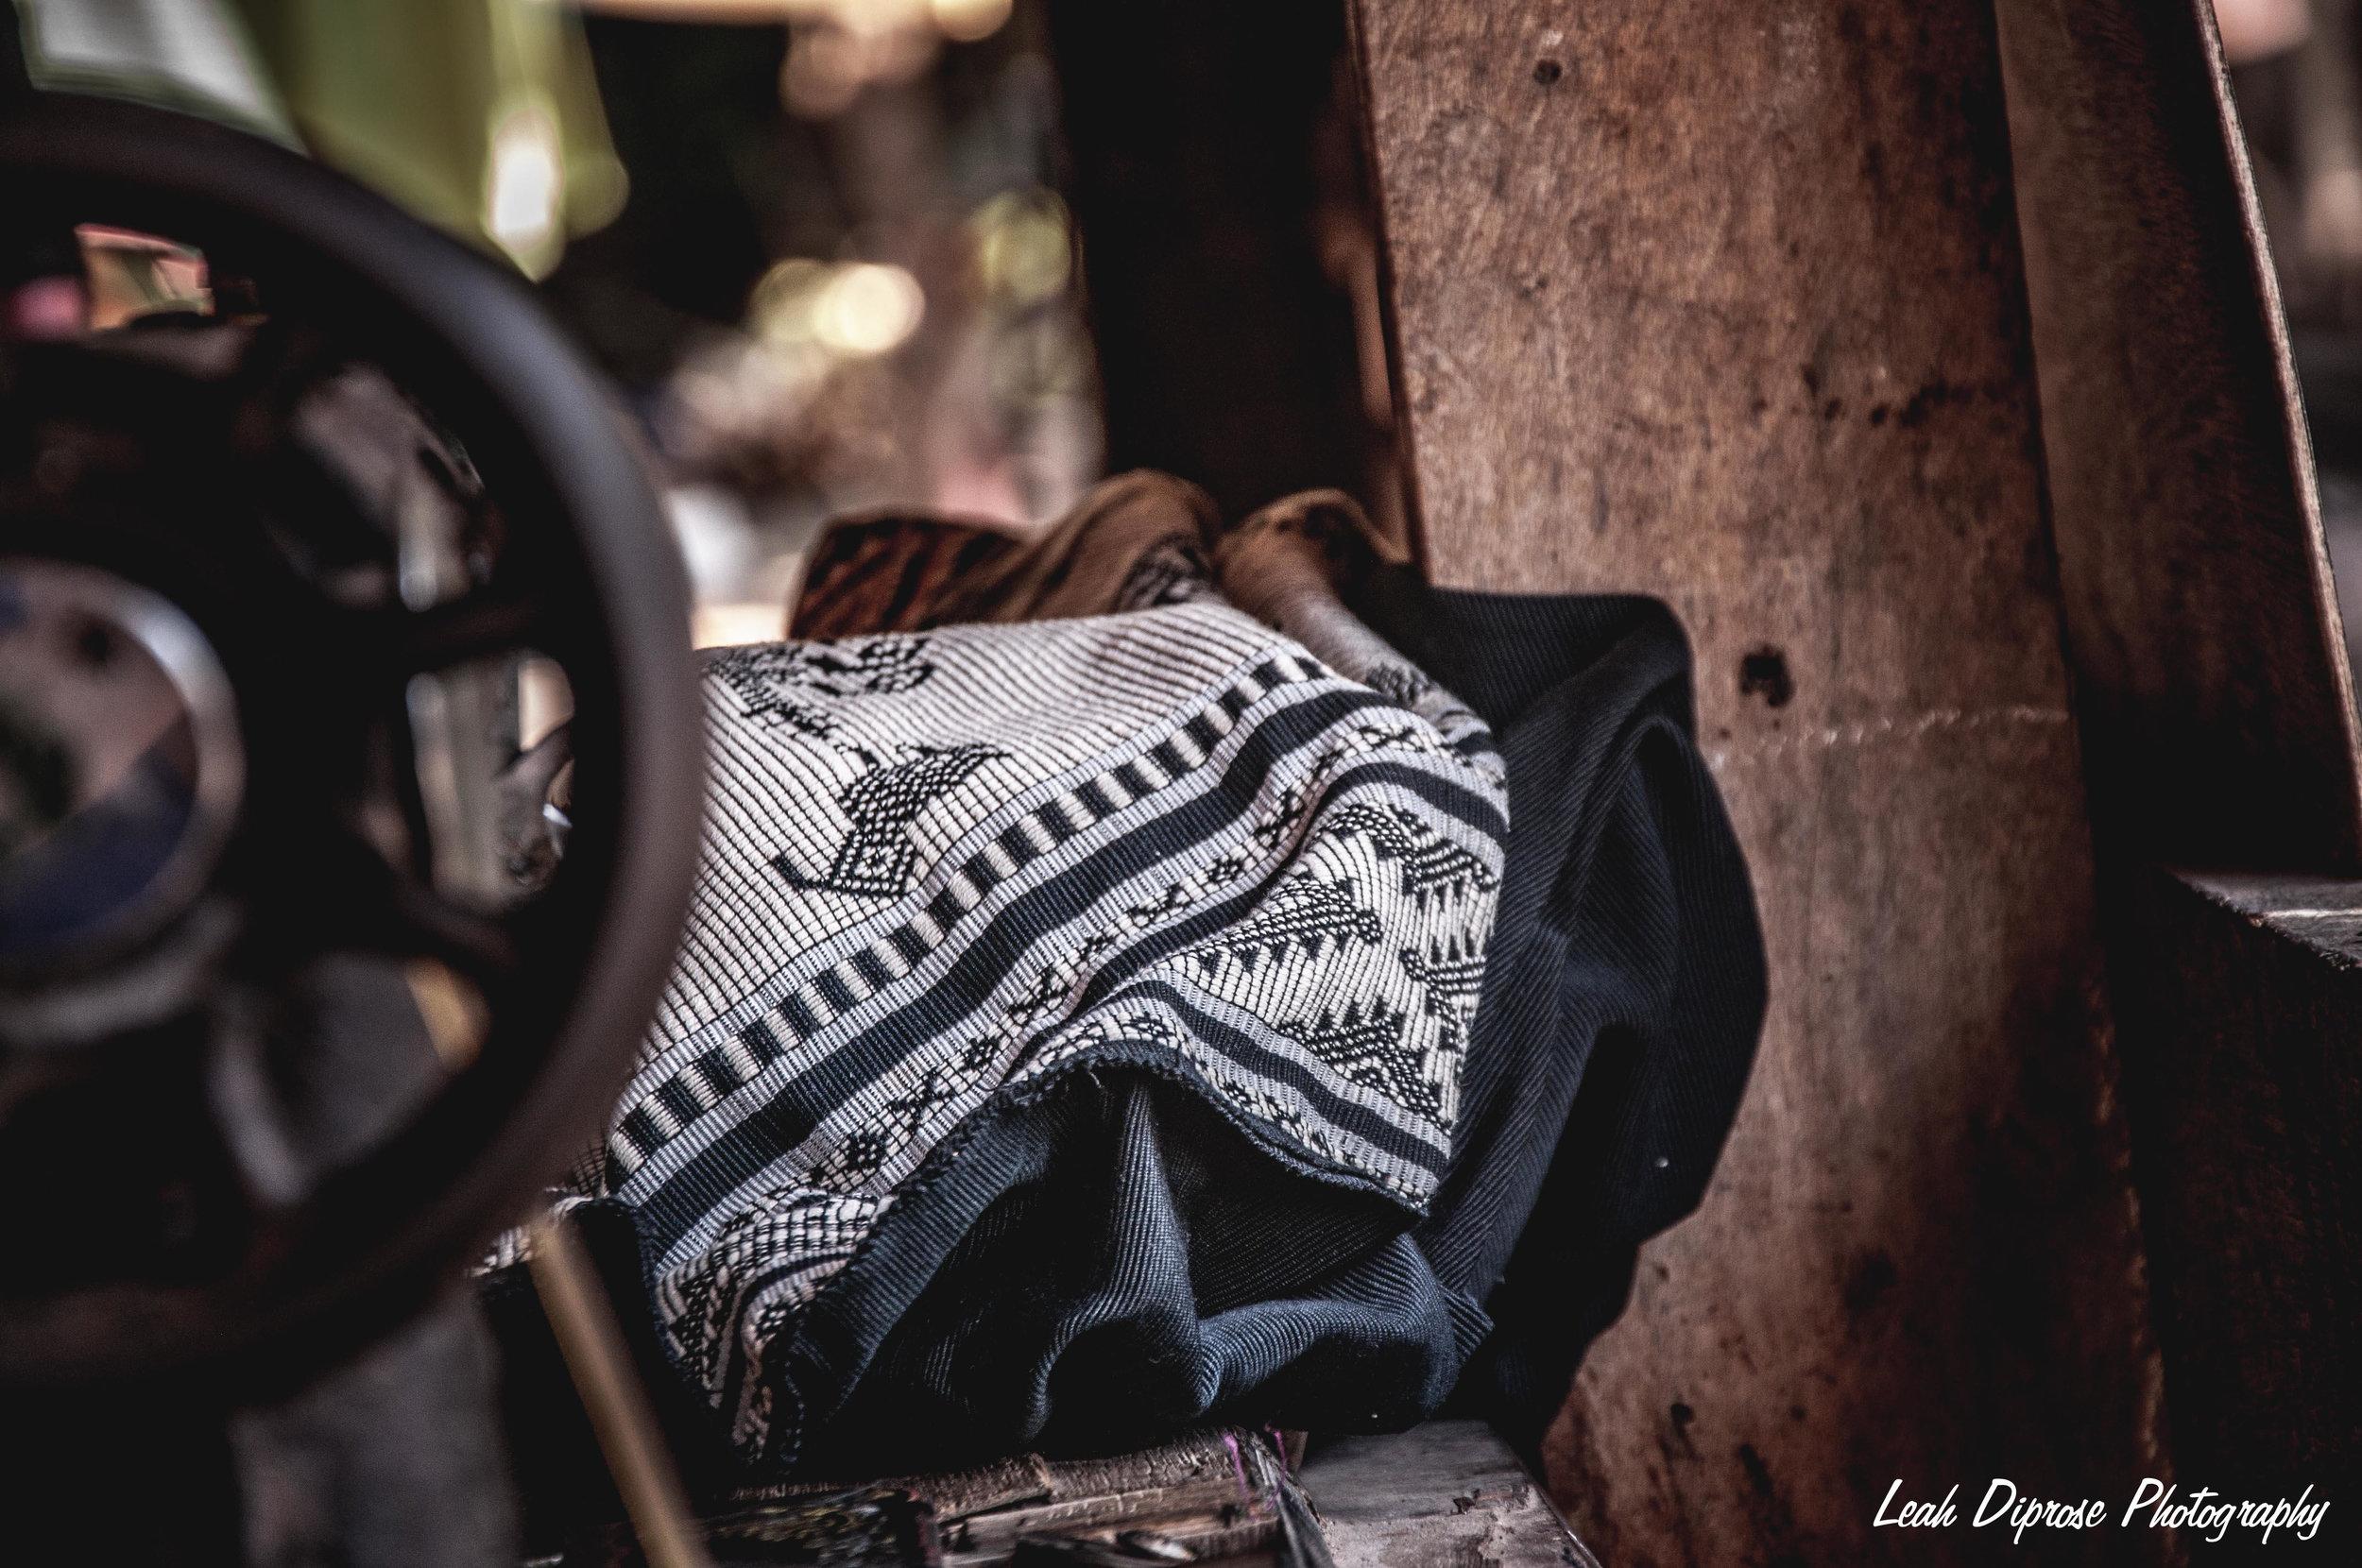 Leah Diprose Photography image-4853.jpg